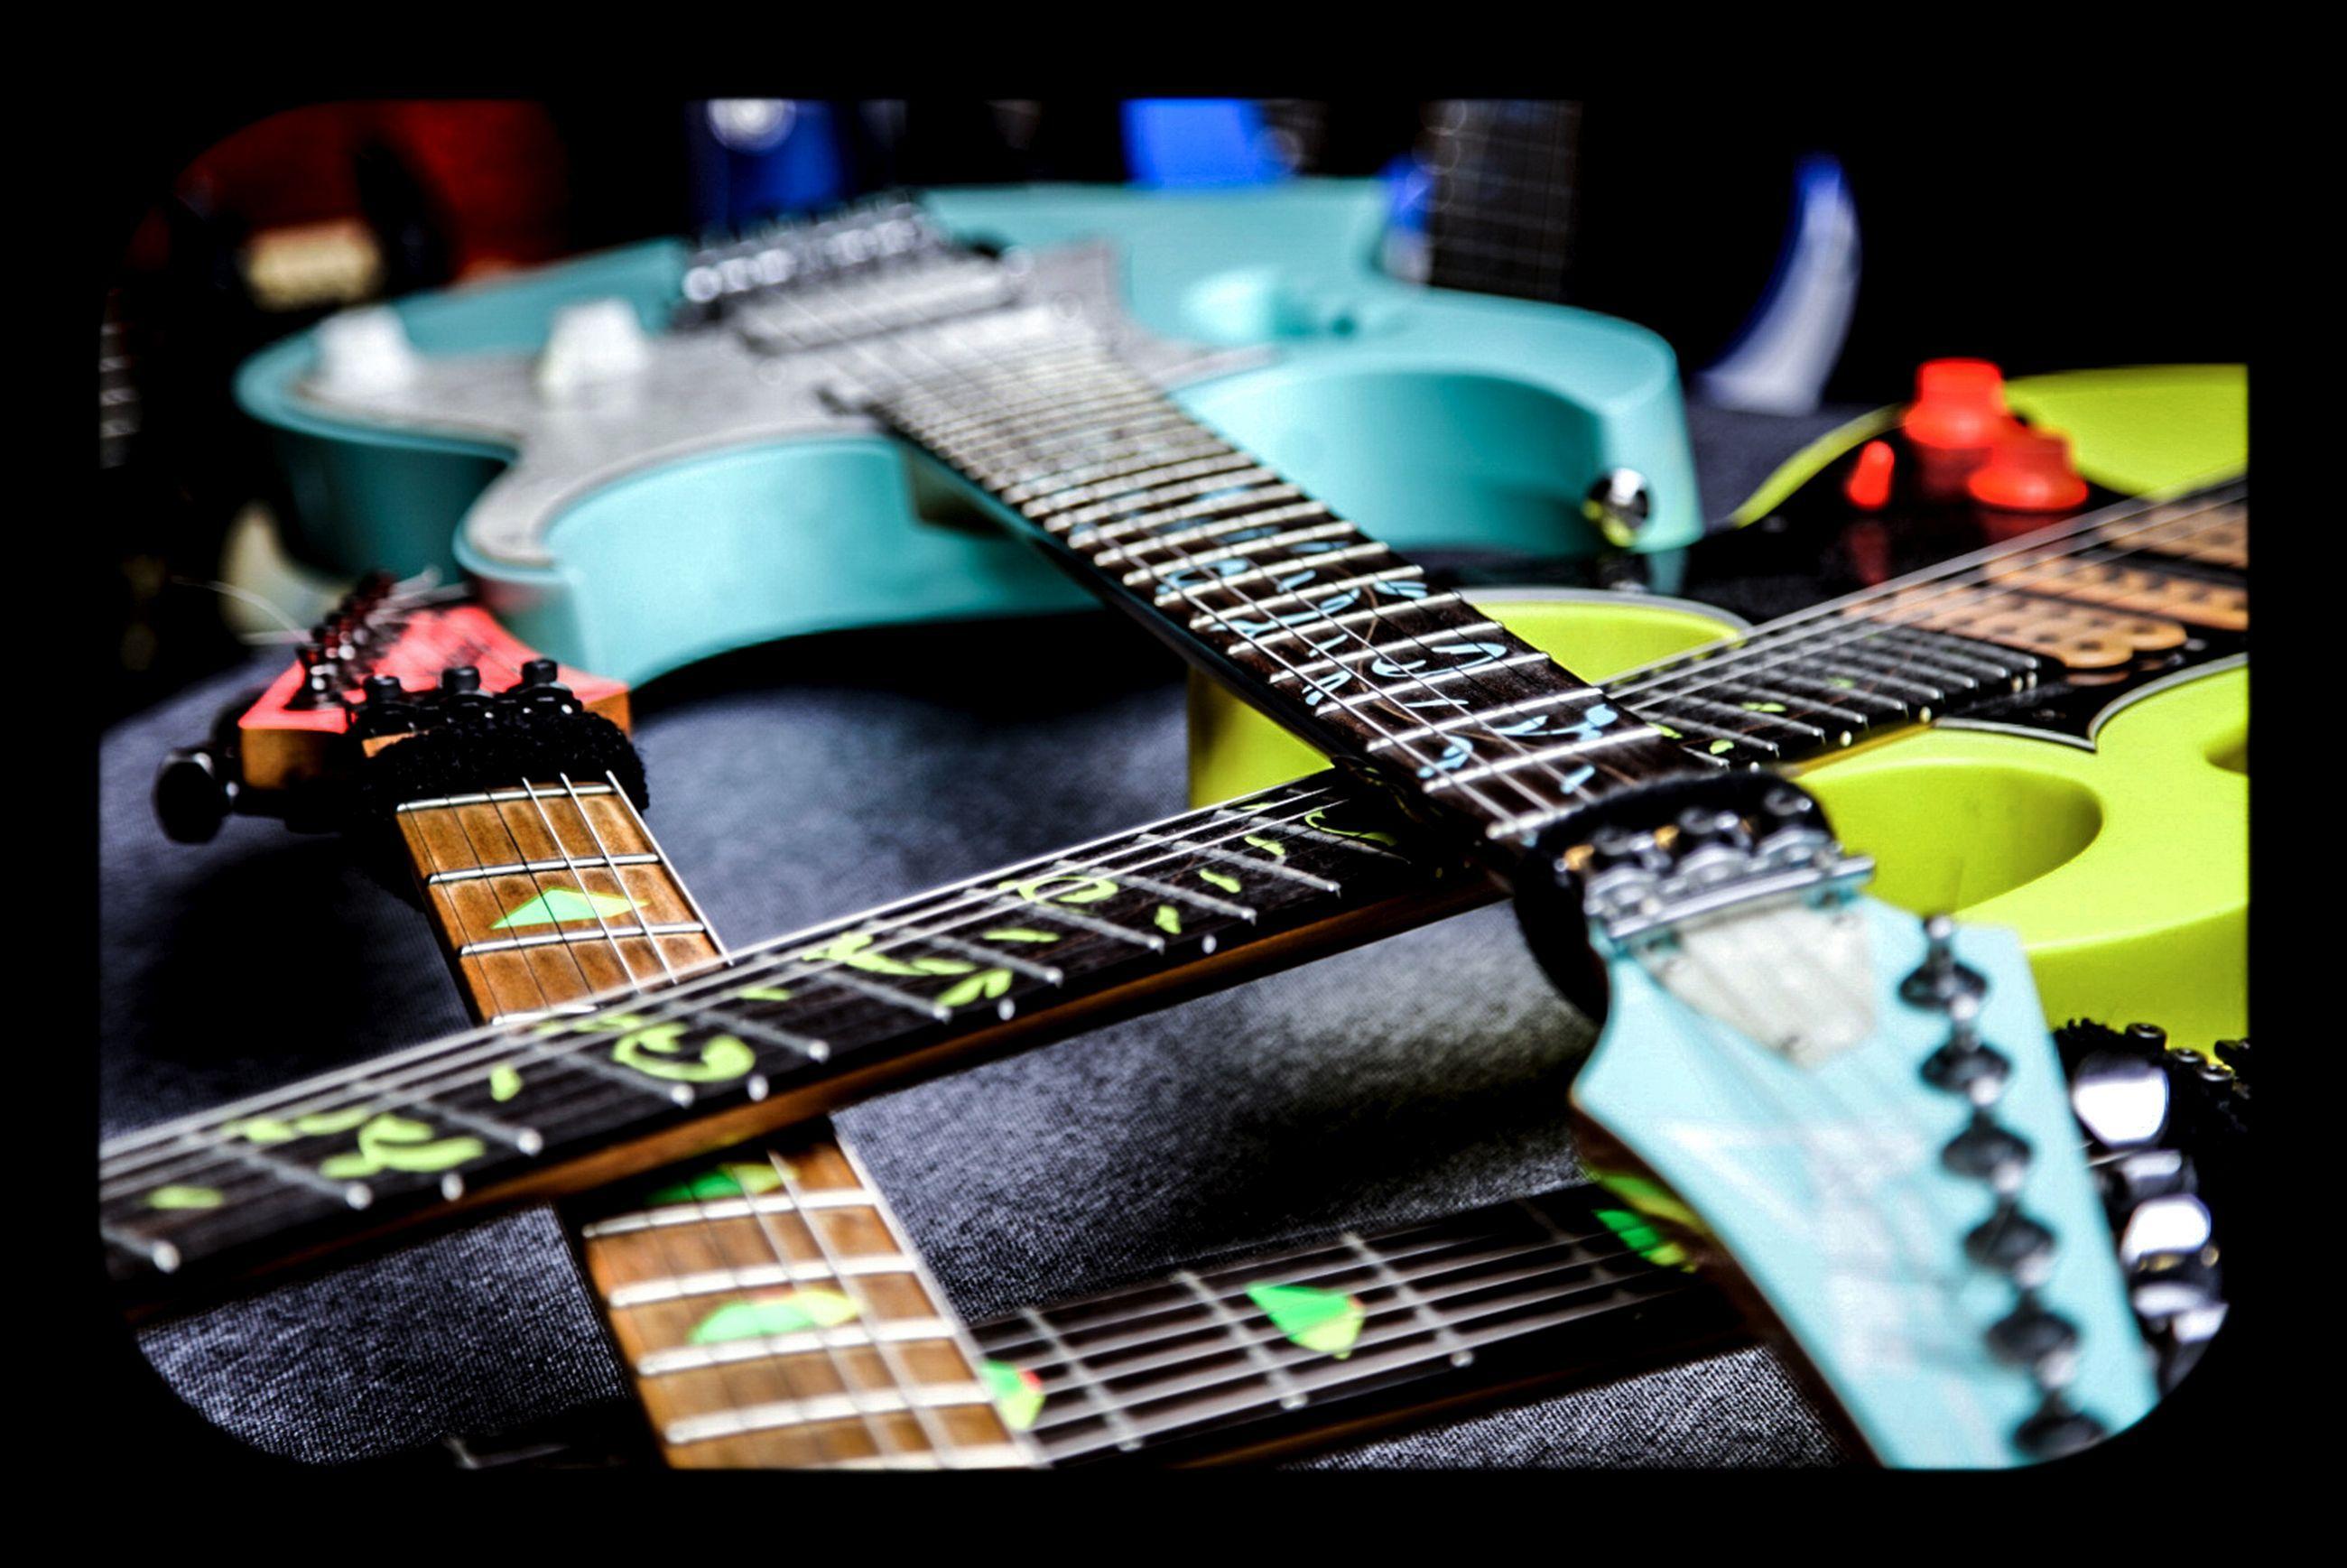 Ibanez Steve Vai Gitarren In 2020 Gitarrenschule Gitarre Gitarrenlehrer